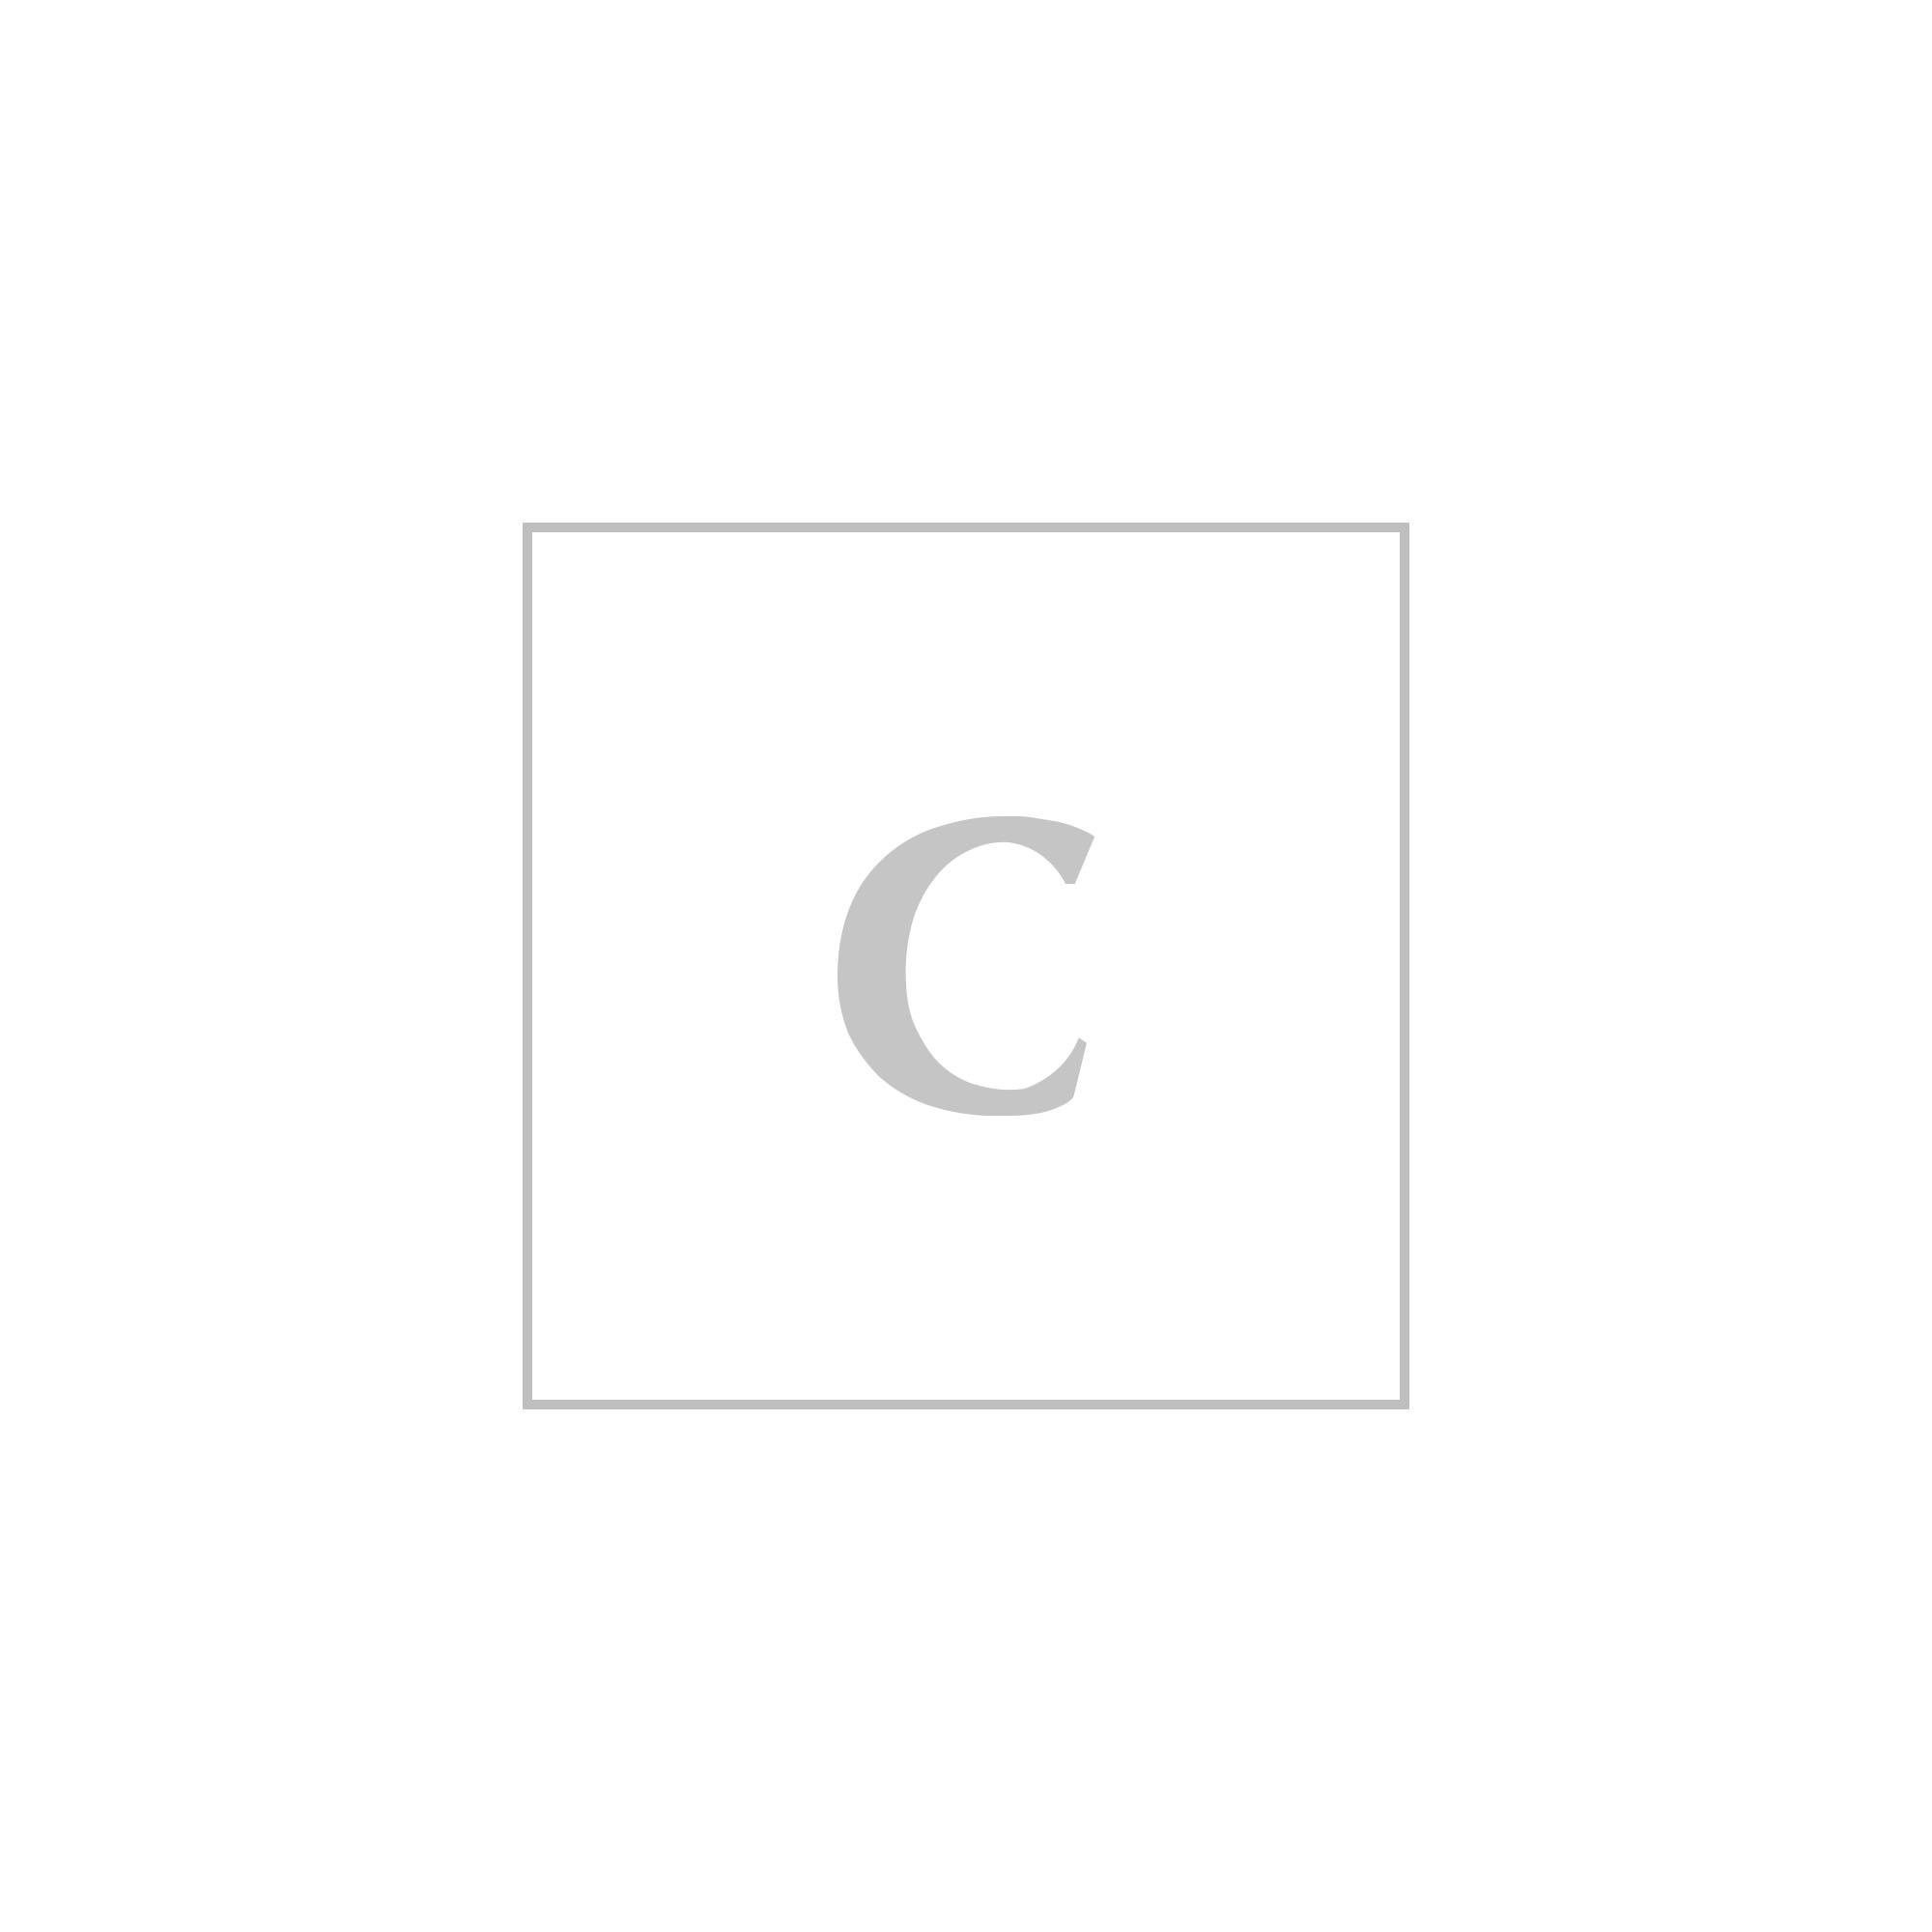 Saint laurent monogram clutch